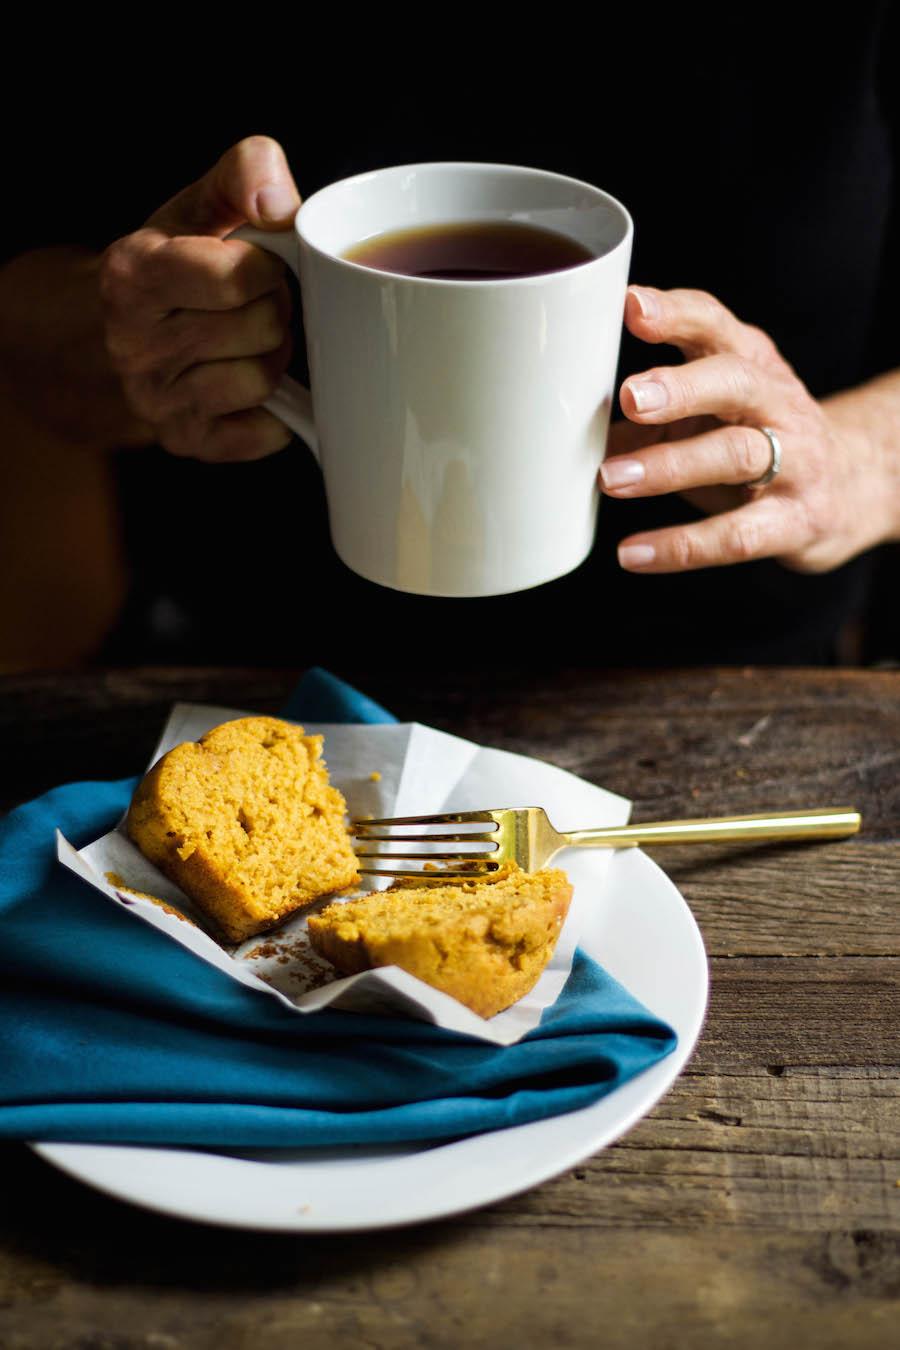 Pumpkin Spice Muffin with Tea